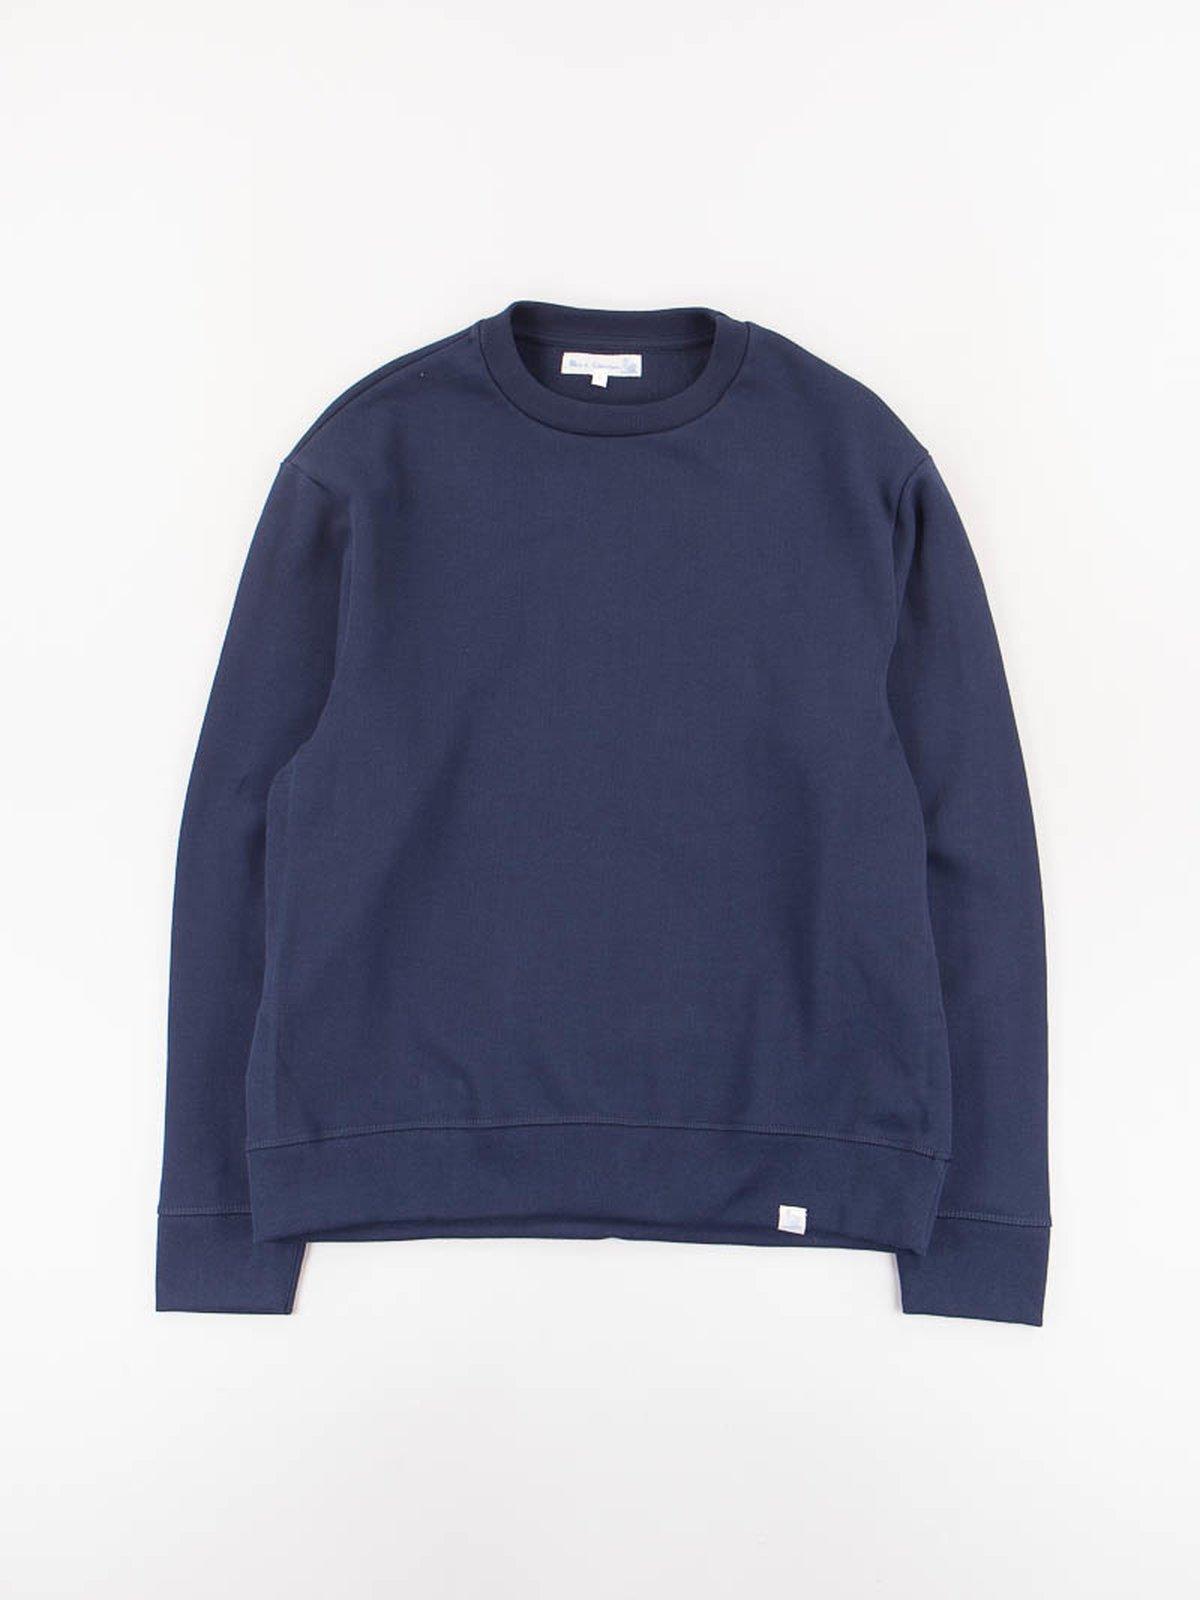 Ink Blue 346OS Organic Cotton Oversized Sweater - Image 1